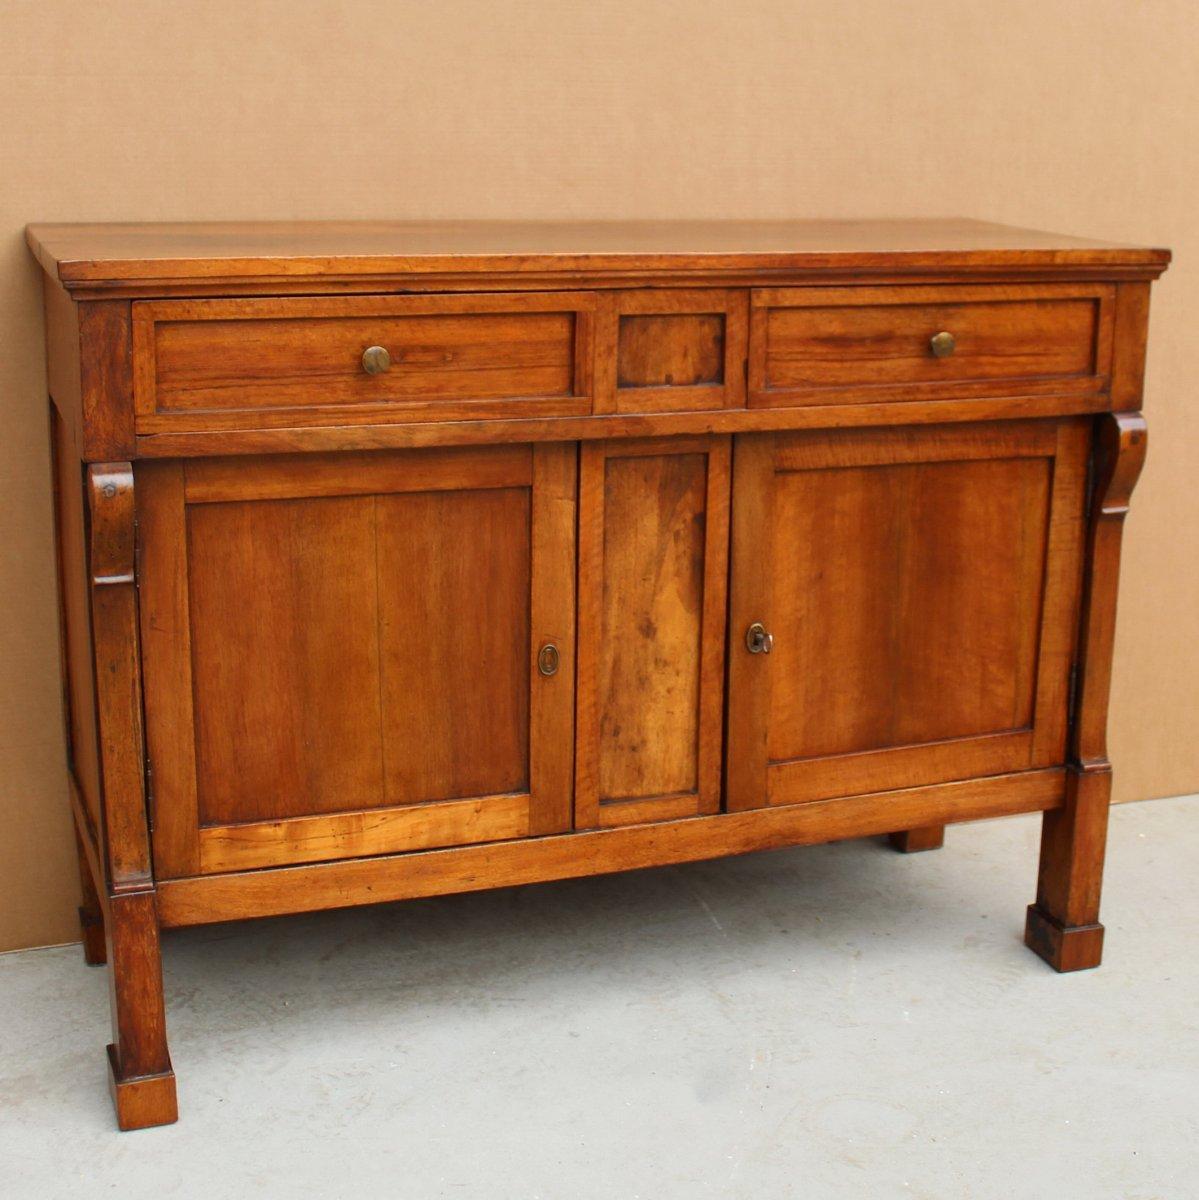 Antique Empire Sideboard Dresser Cabinet Cupboard Buffet In Walnut - Italy 19th-photo-2